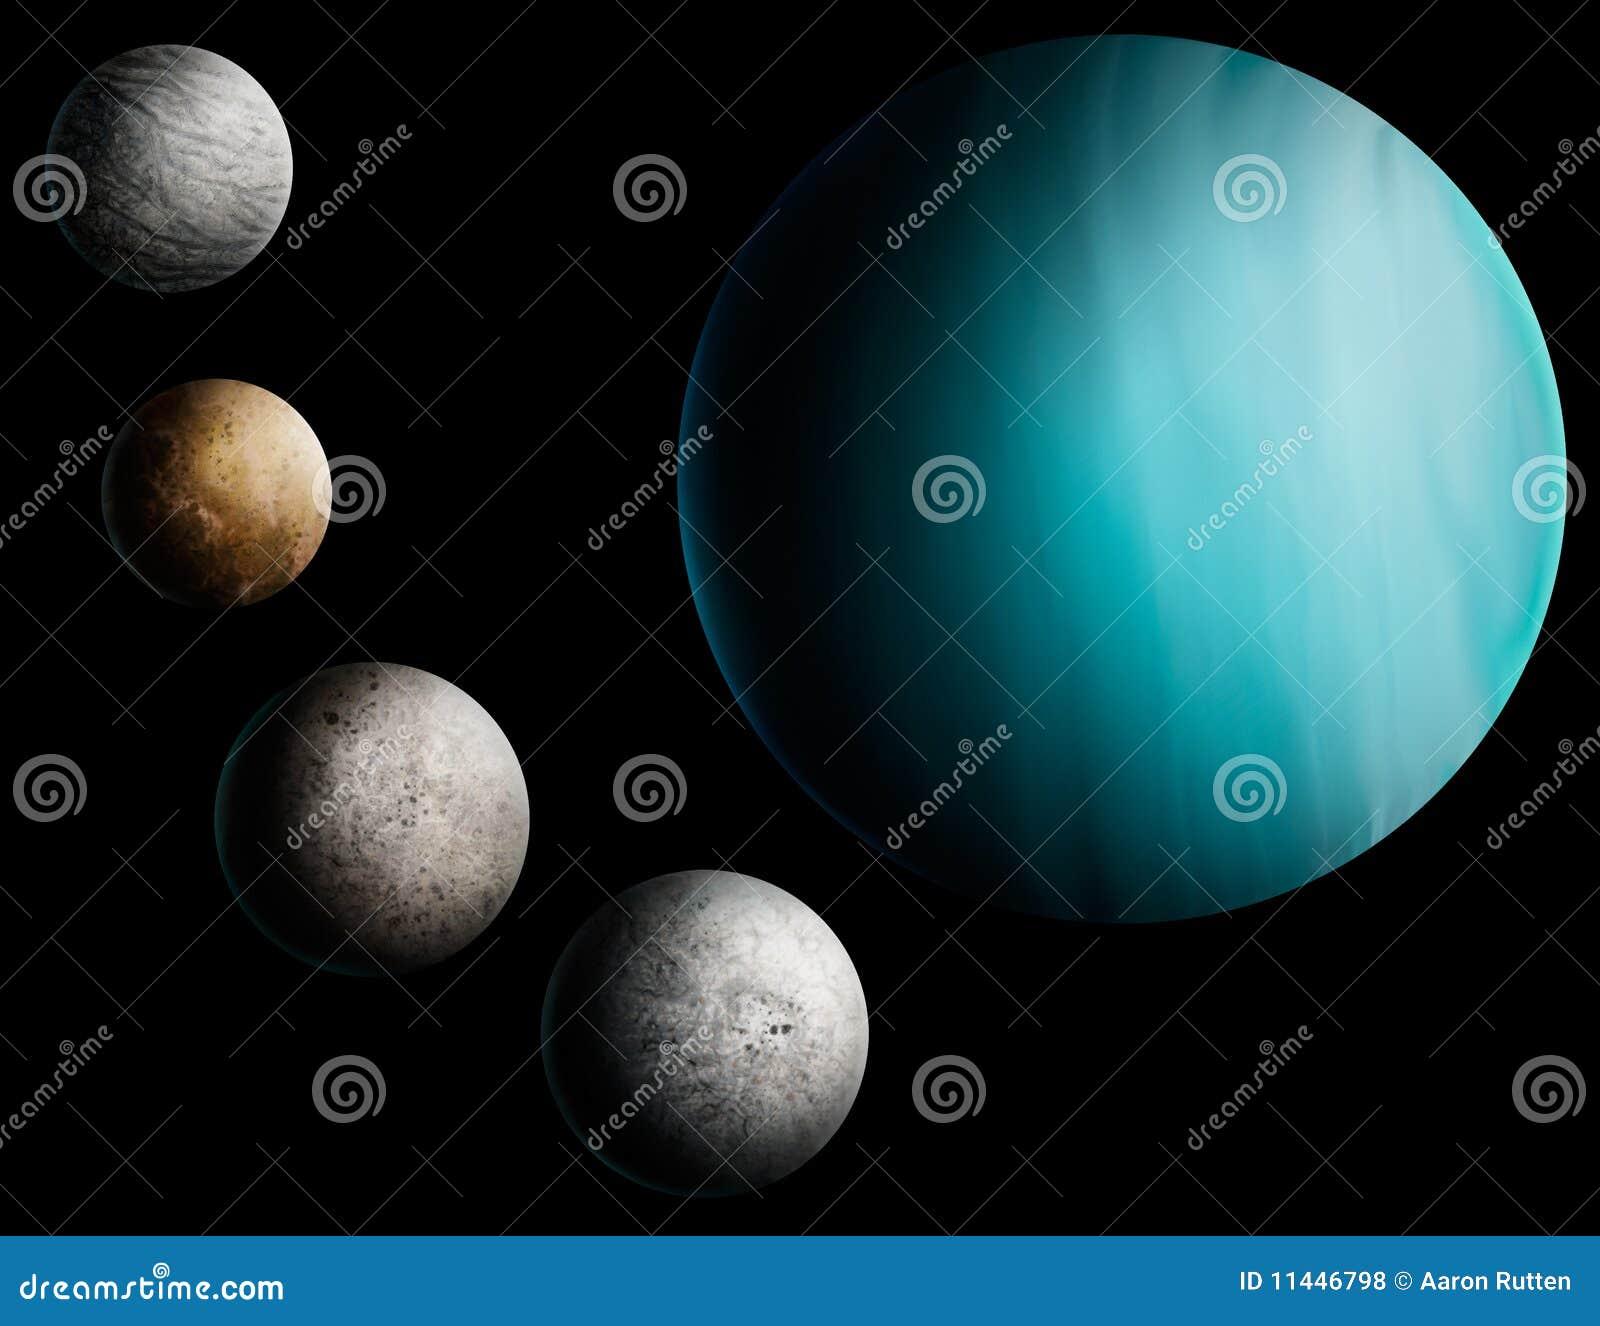 Planet Uranus Digital Art Illustration Royalty Free Stock